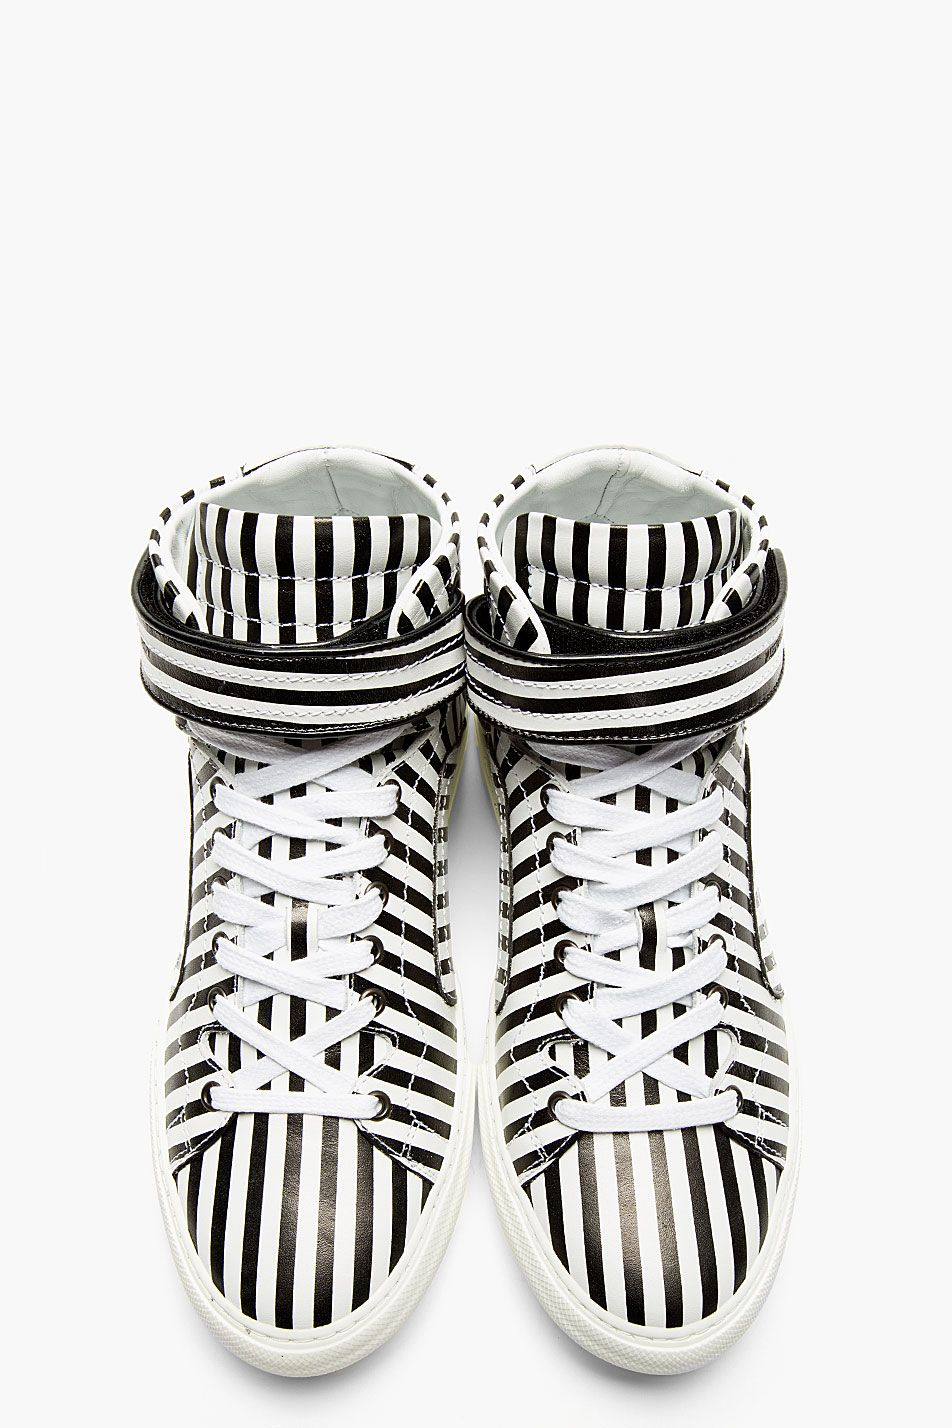 White stripes on black or black stripes